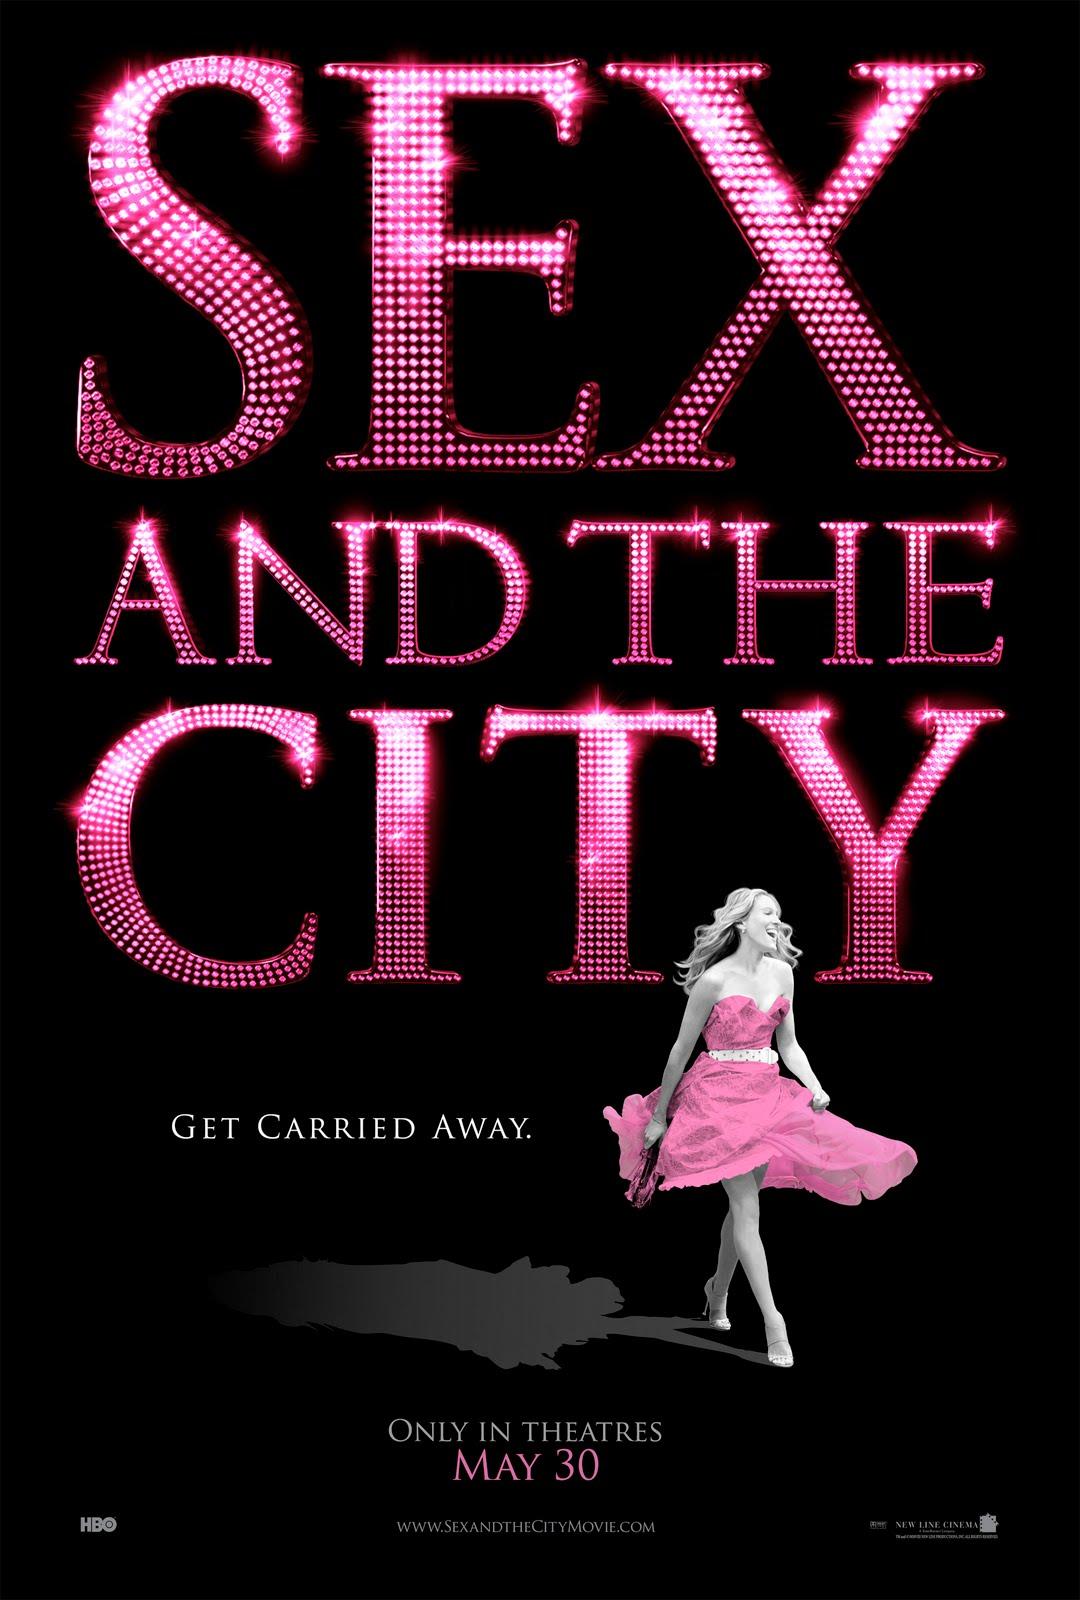 http://4.bp.blogspot.com/_CDdXhBI3rlY/S_Ogb2FrEcI/AAAAAAAAARI/37EOm8EGTyg/s1600/2008_sex_and_the_city_poster_001.jpg